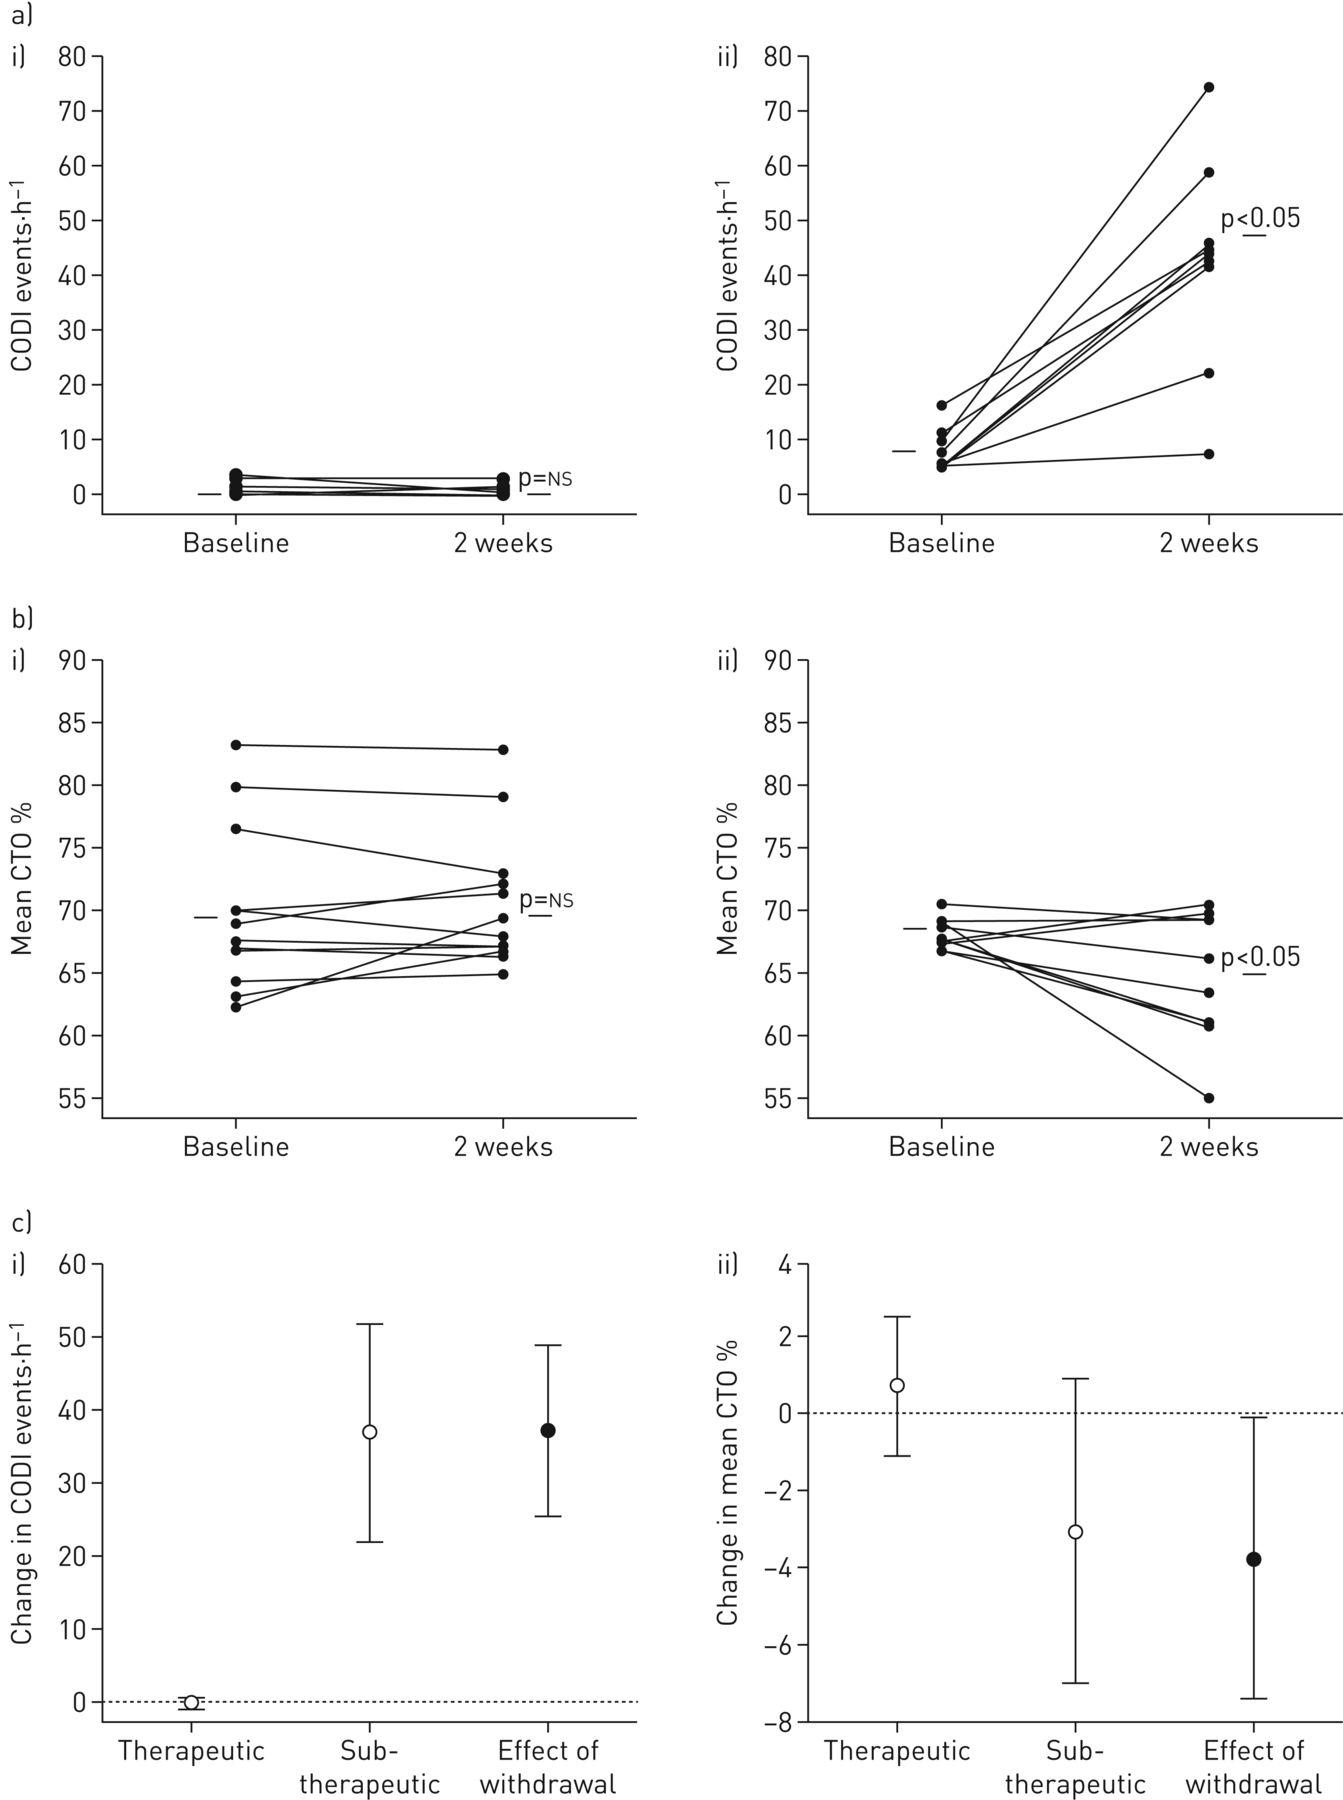 Nocturnal cerebral hypoxia in obstructive sleep apnoea: a